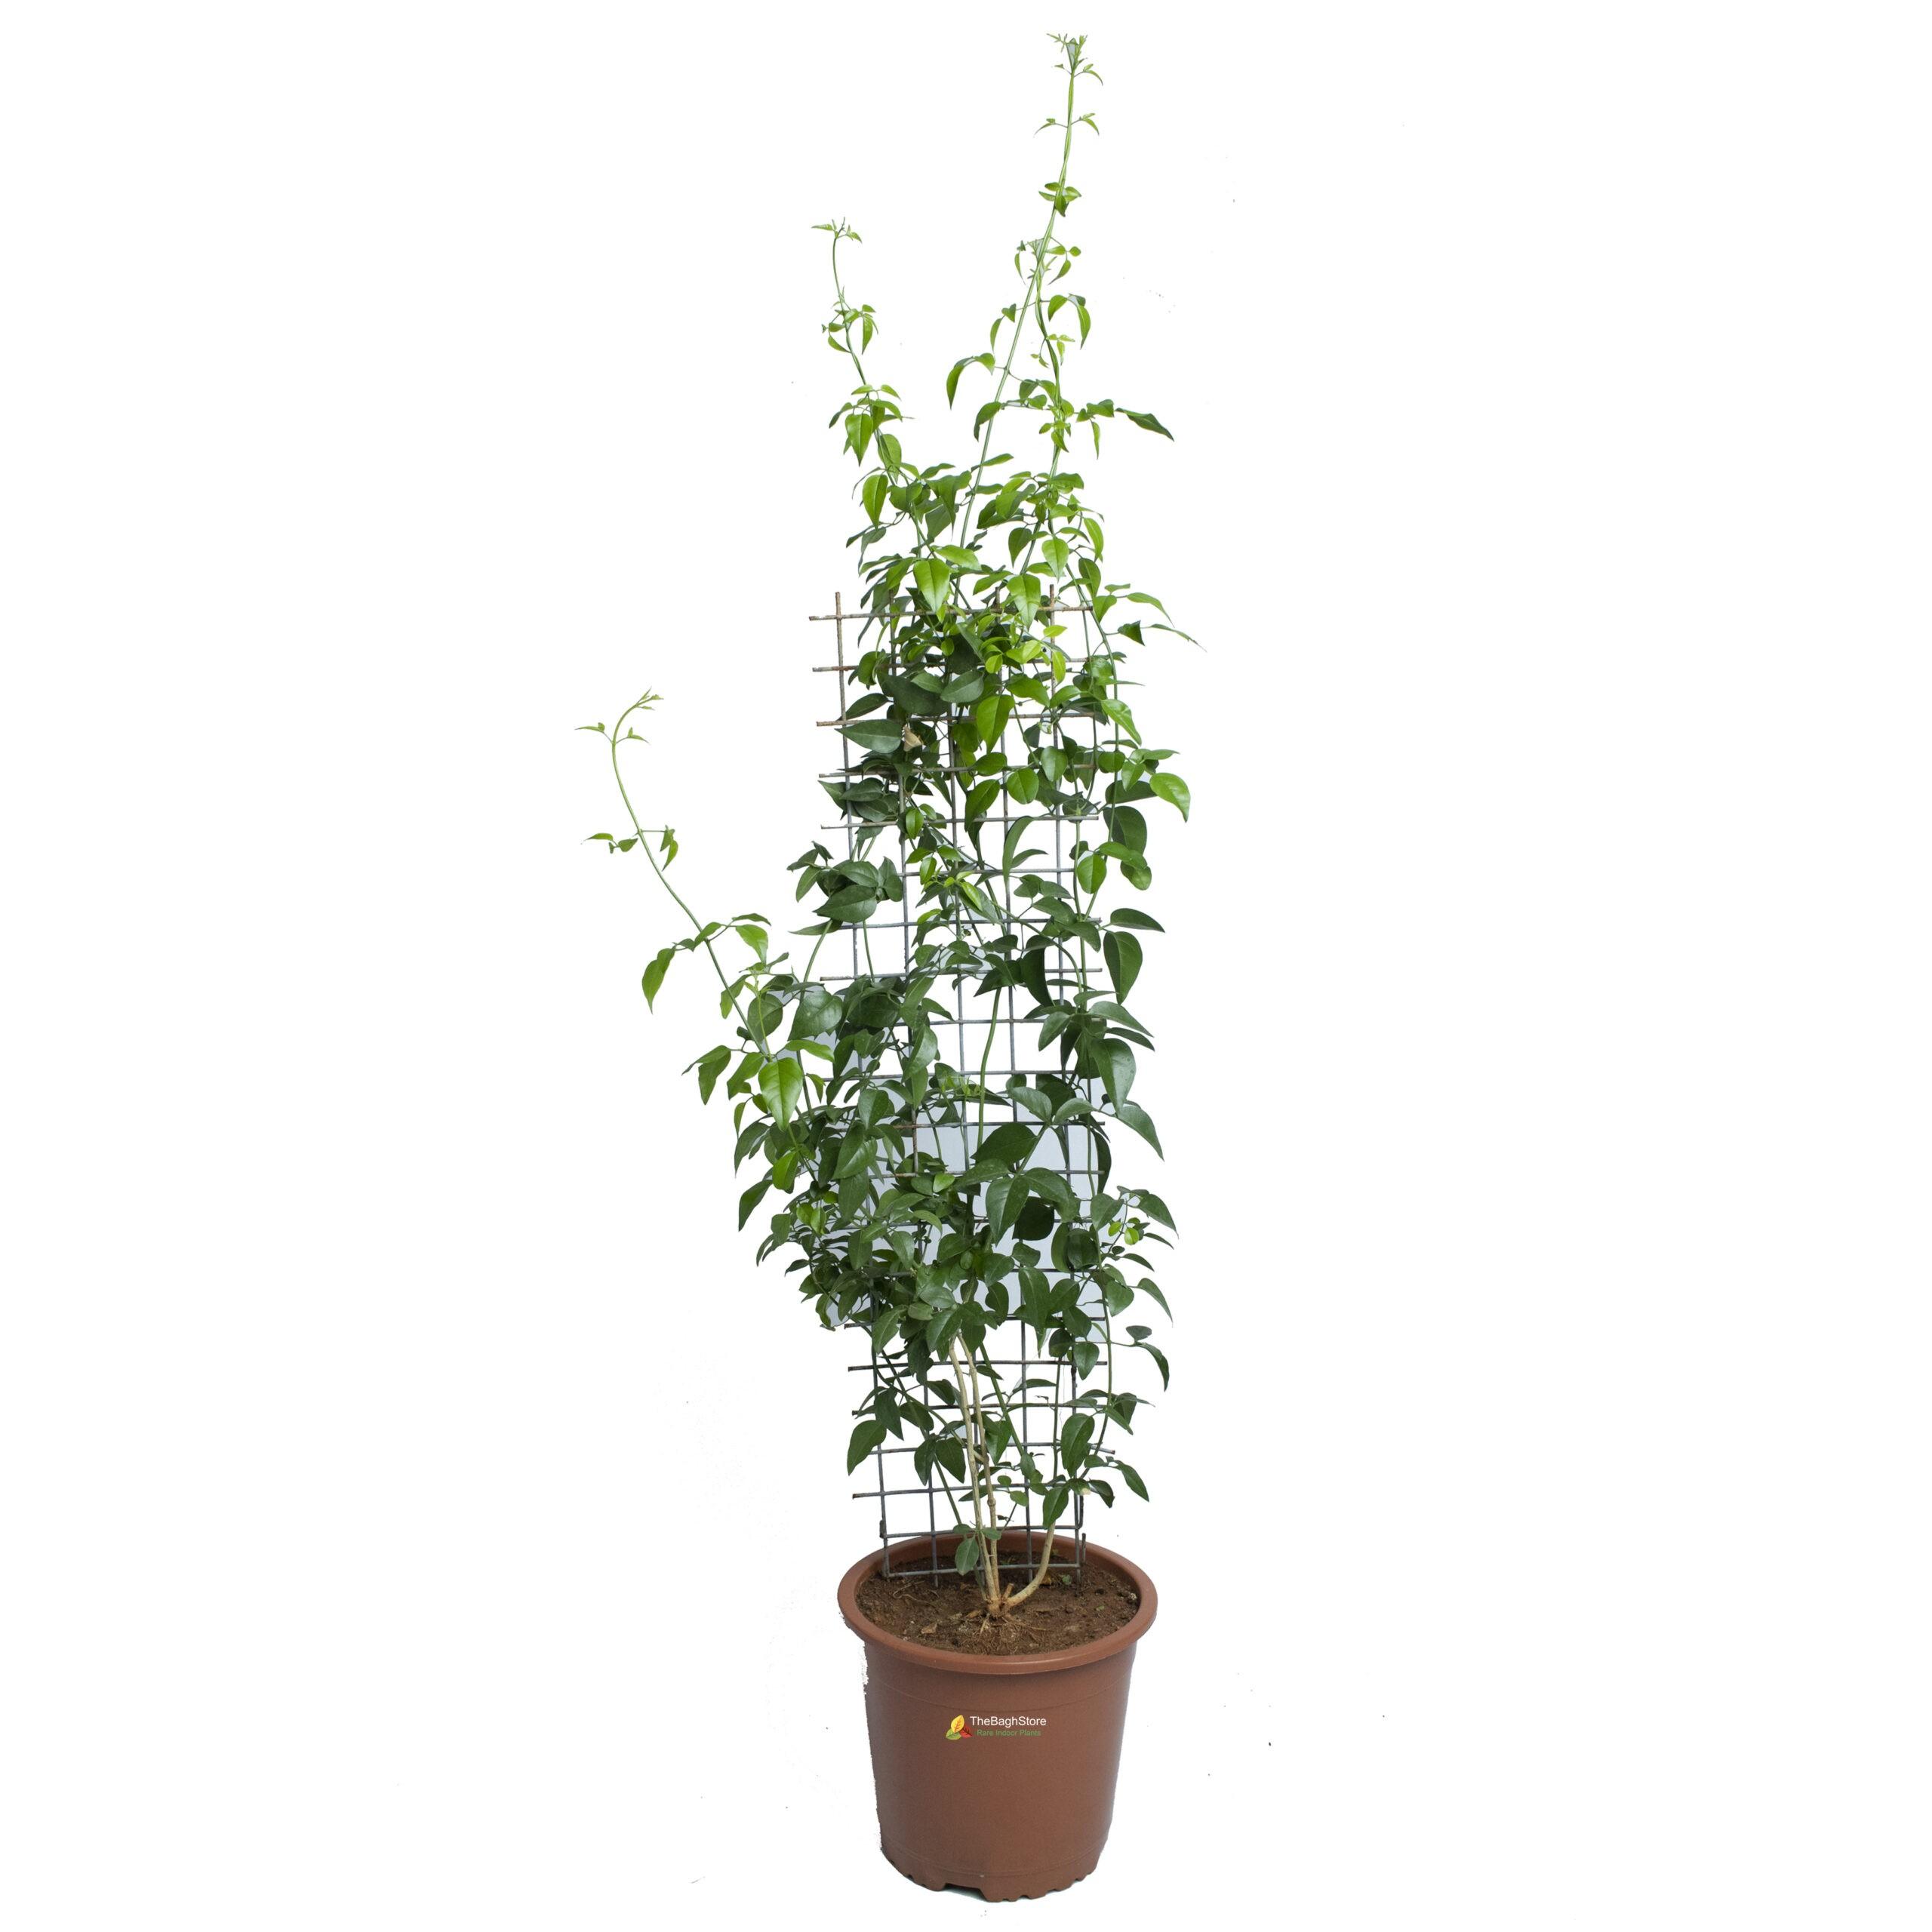 Jasmine Vine, Jasmine Climber Creeper, Star Jasmine ,Trachelospermum Jasminoides - Plant